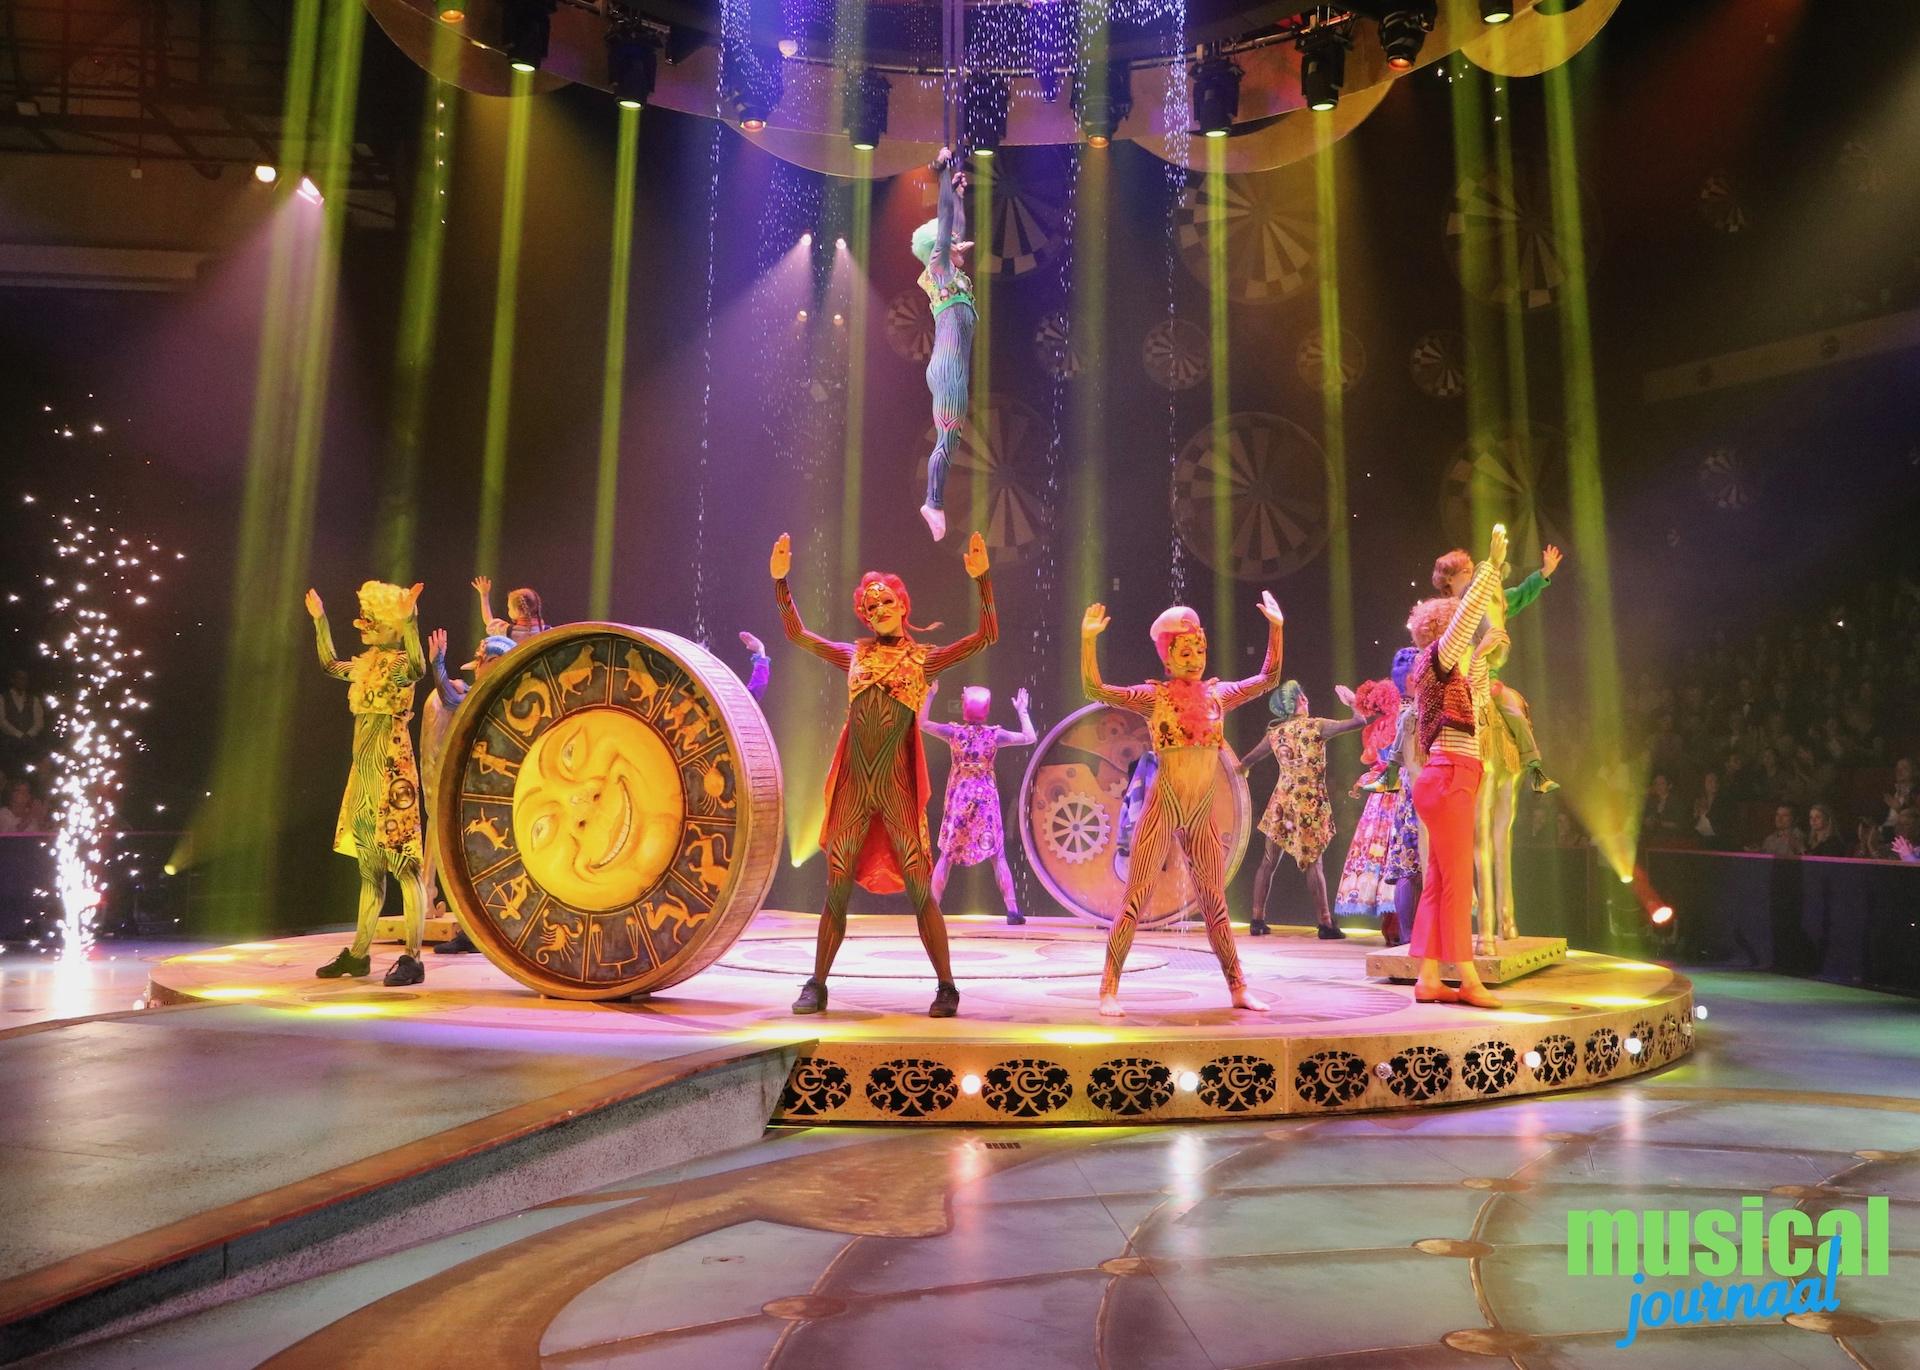 Efteling-theatershow Caro: magisch spektakel